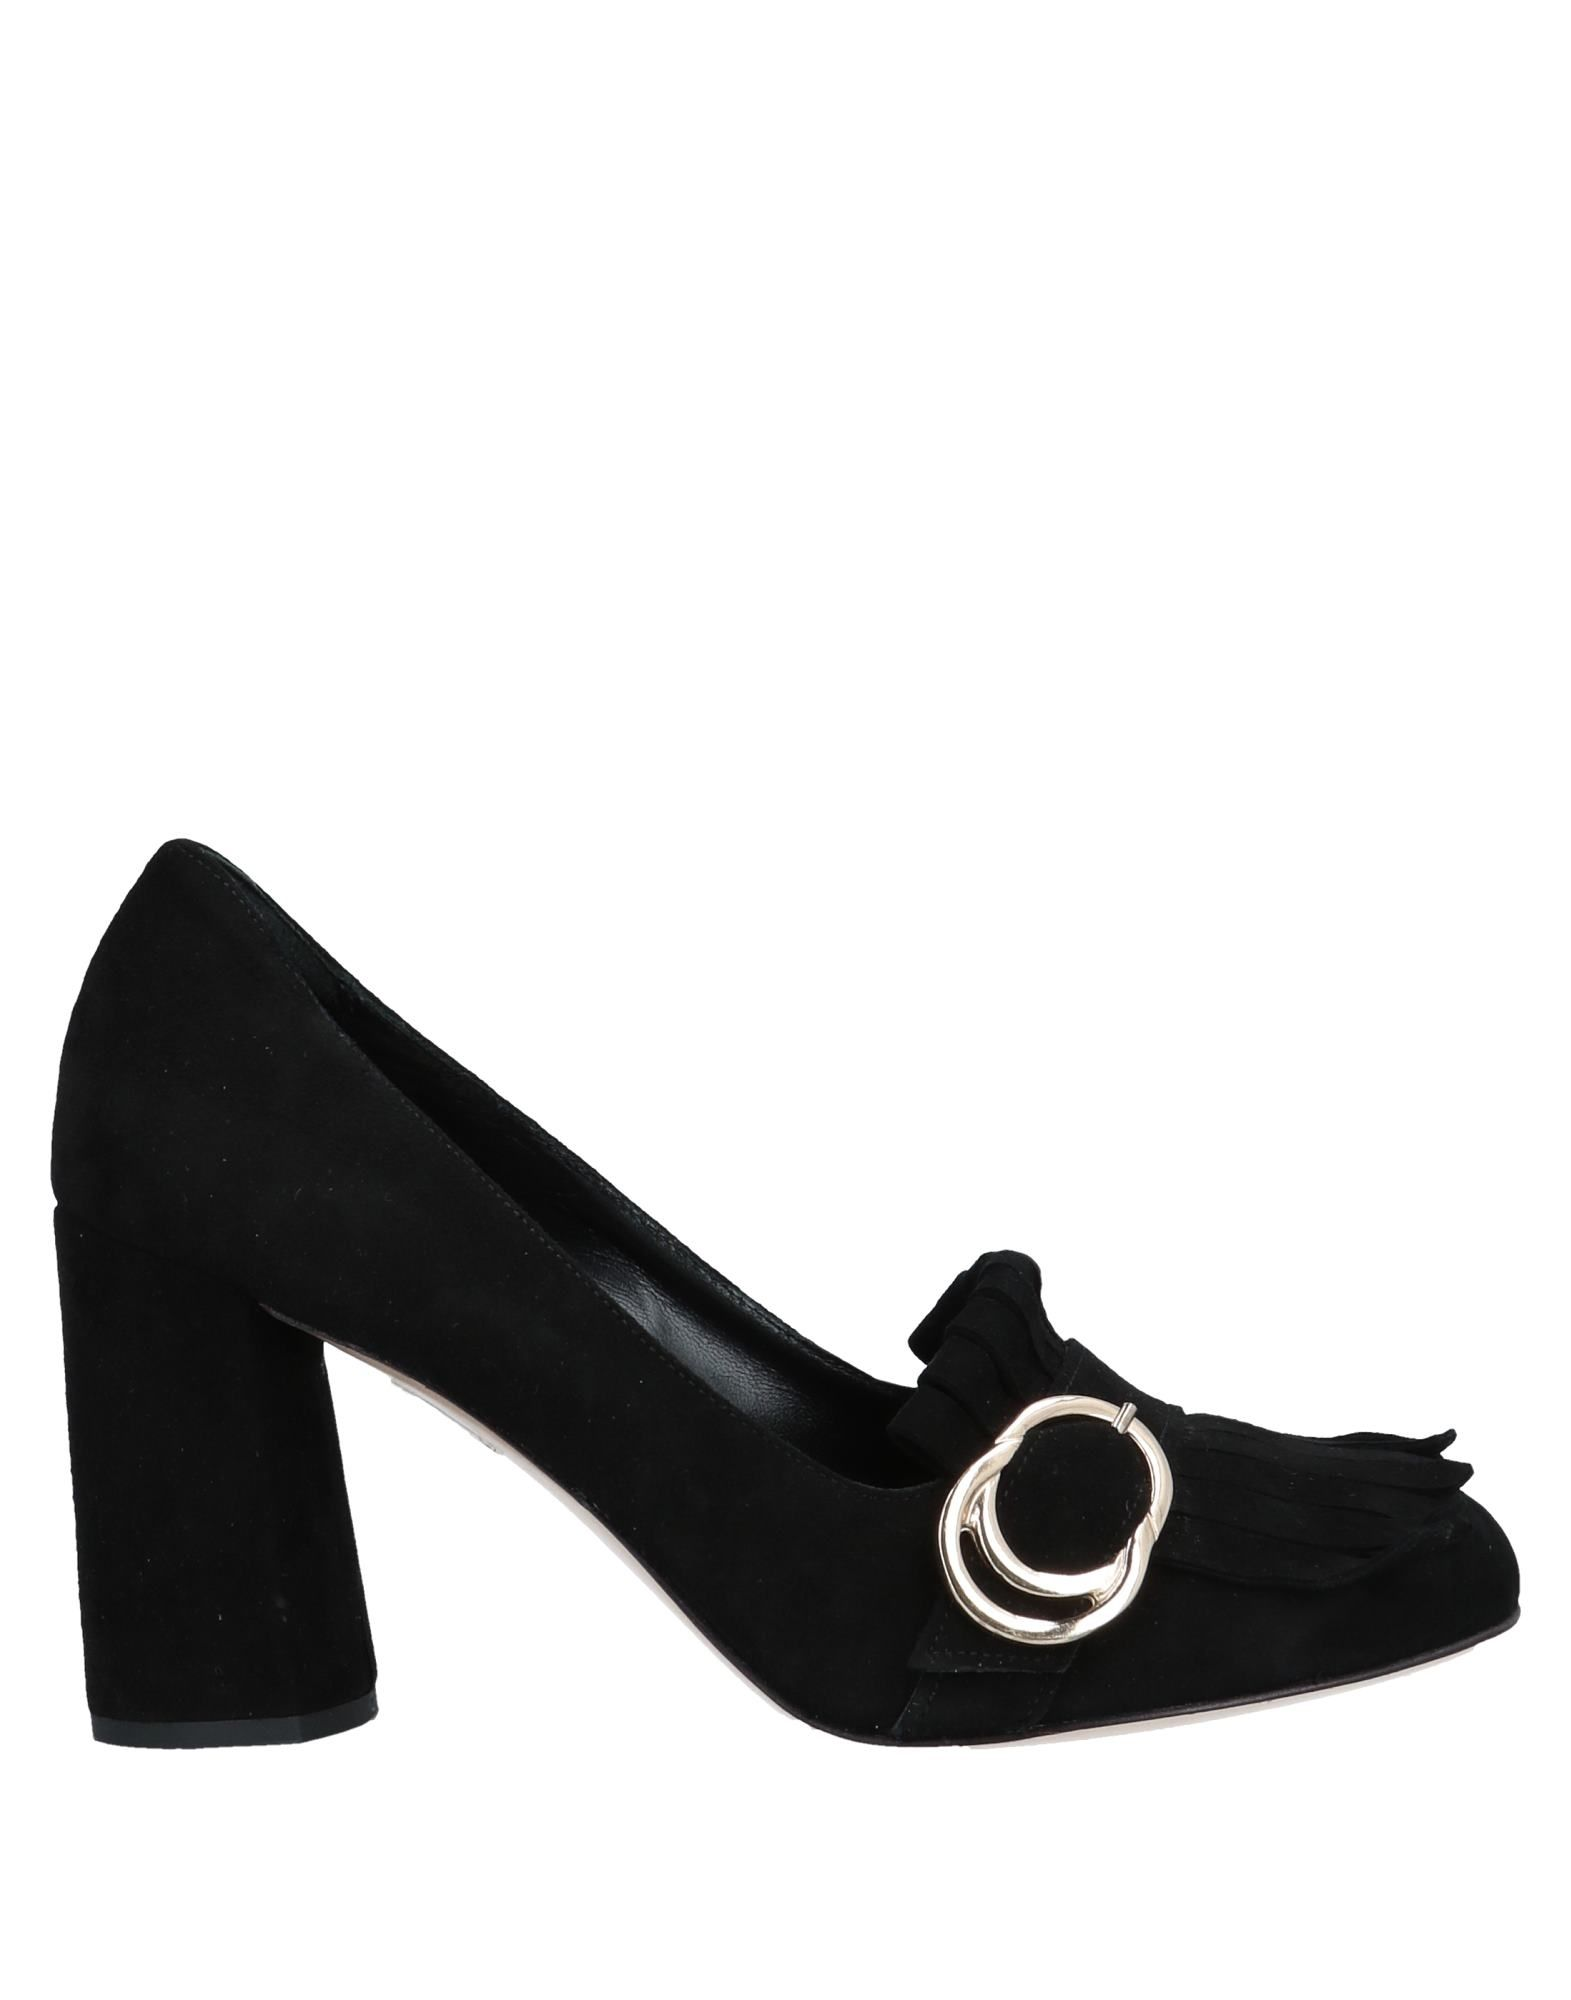 Lea 11559373AT Gute Qualität beliebte Schuhe